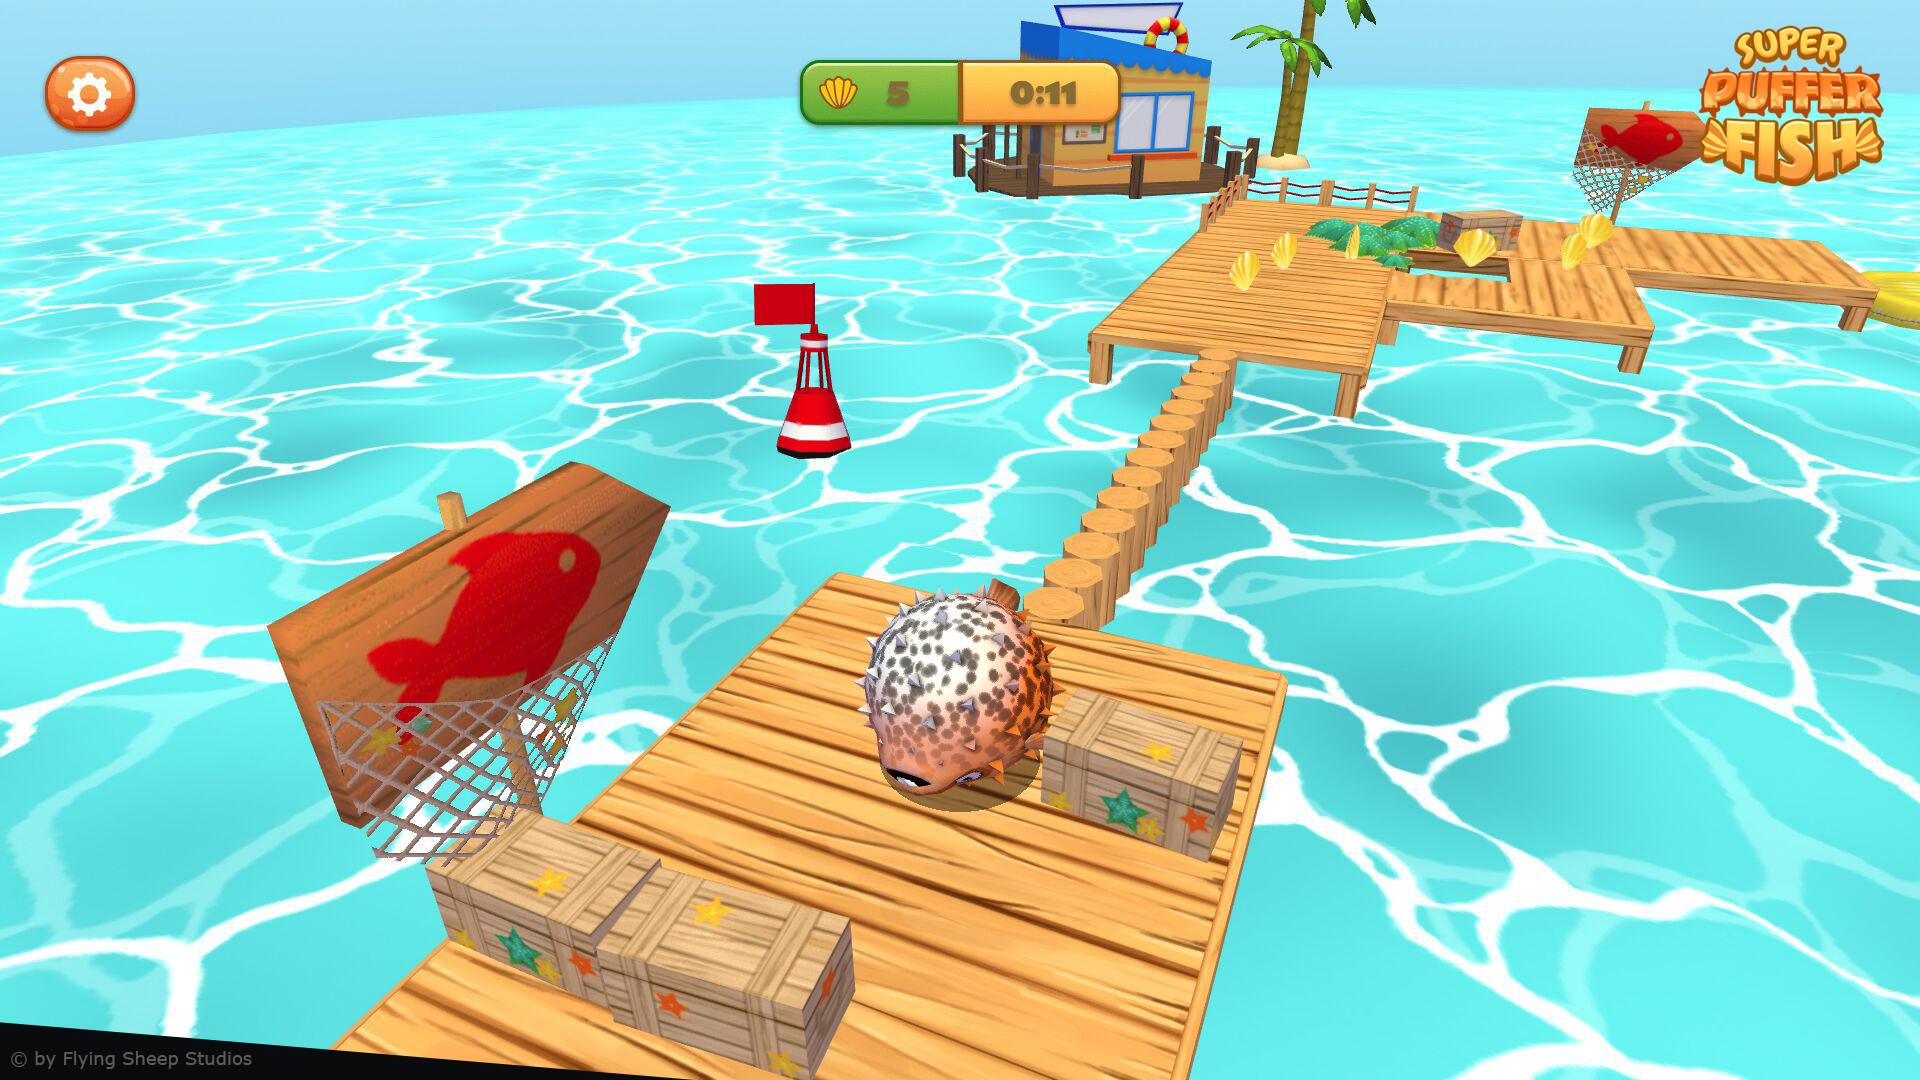 Marina hahn pufferfish screenshot 4